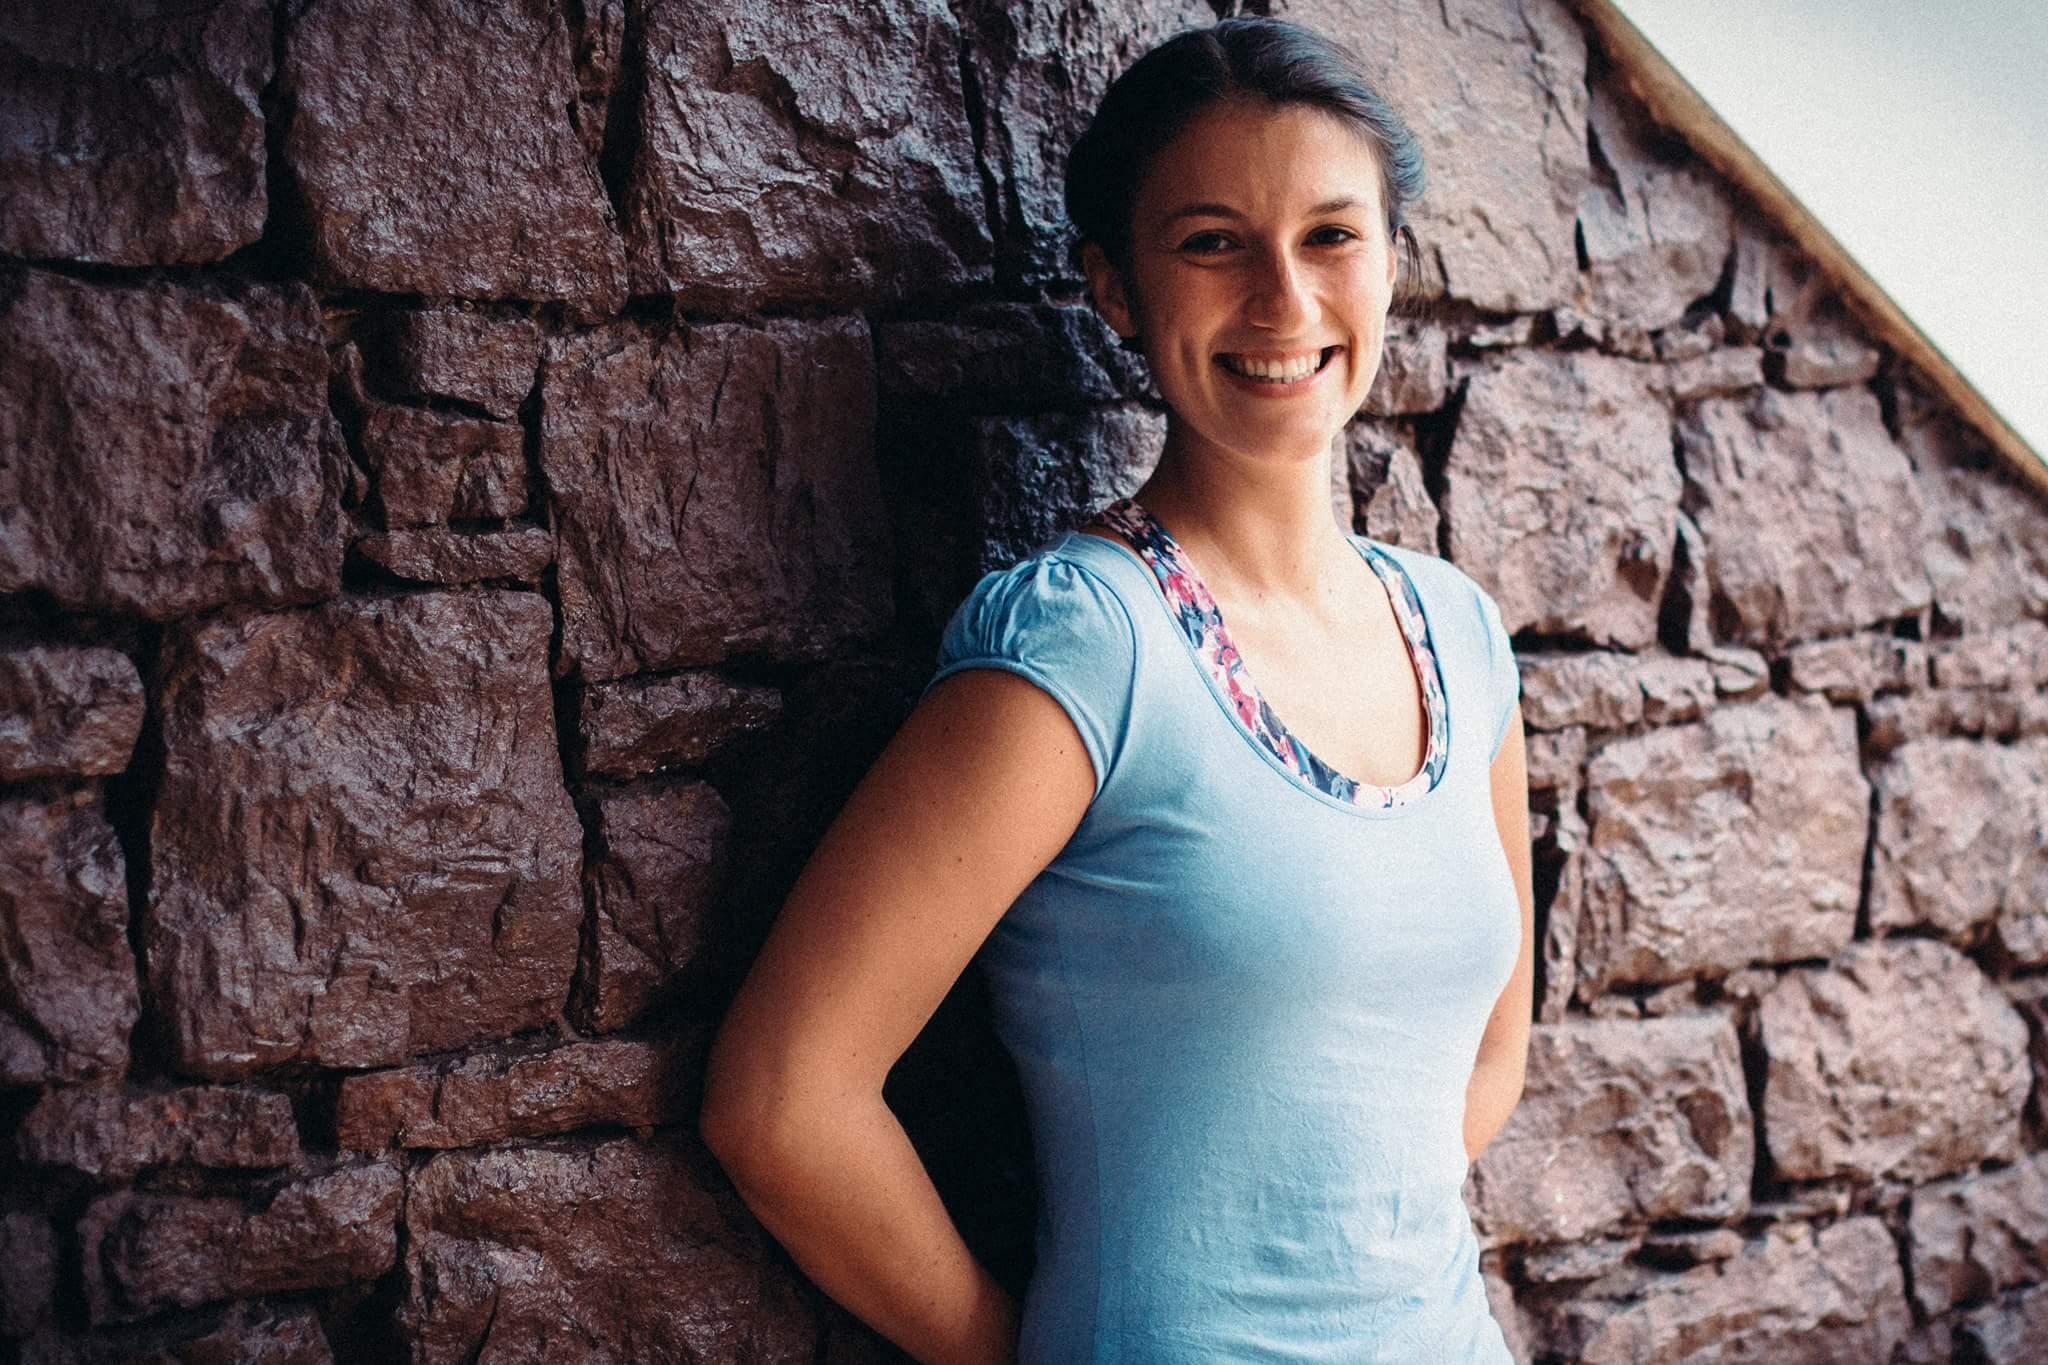 Alexa Yogalehrerin Yogama